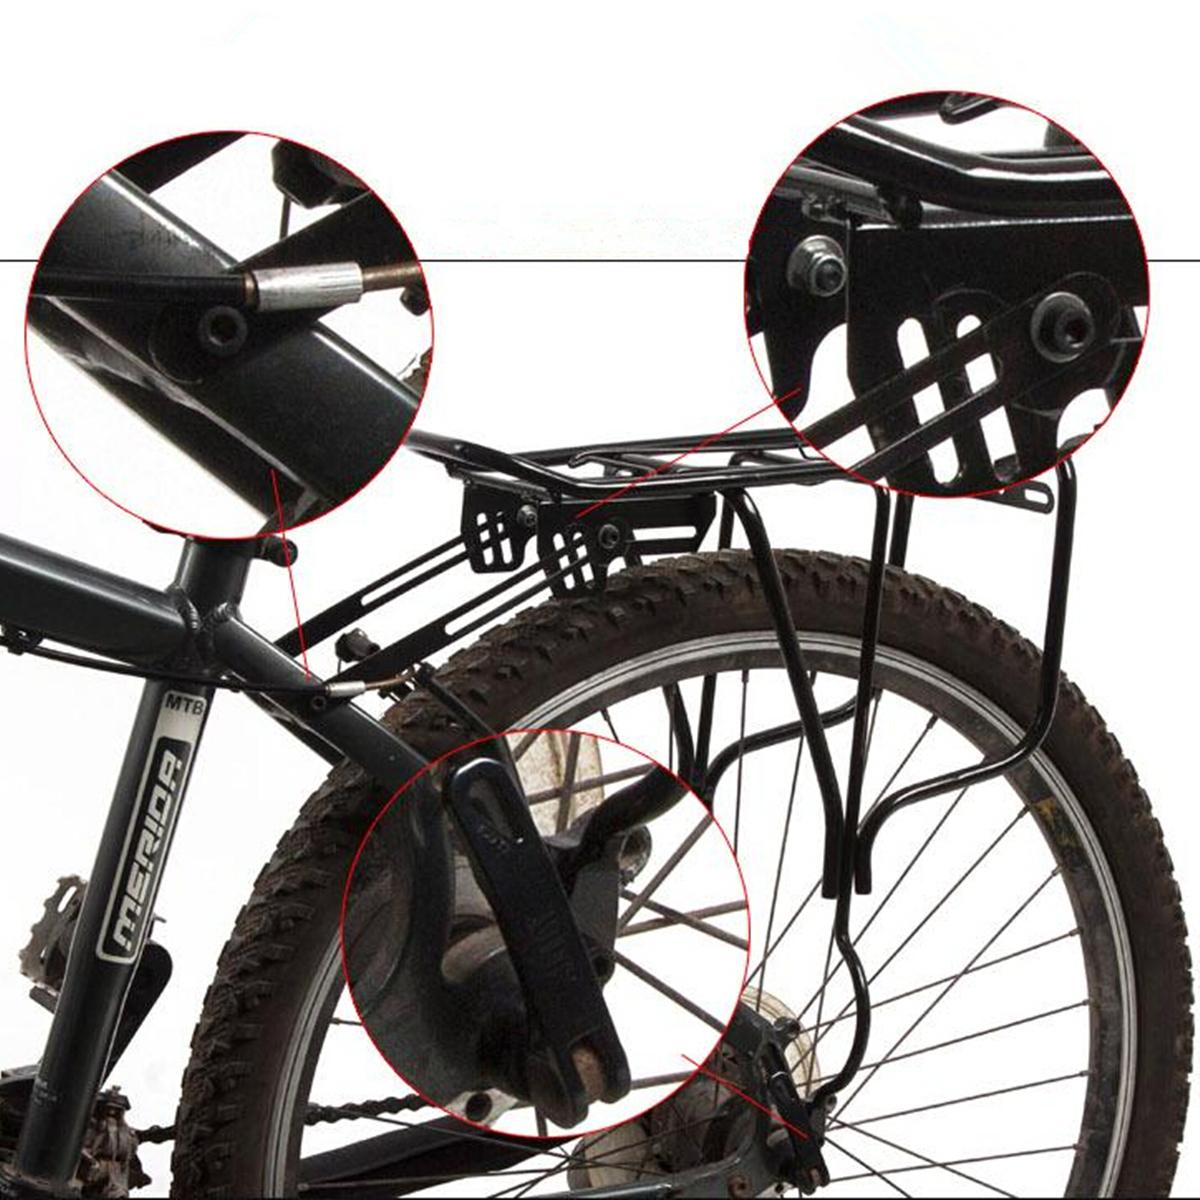 Extendable Bike Rack : Shaft mount bicycle extendable bike cycling pannier rear